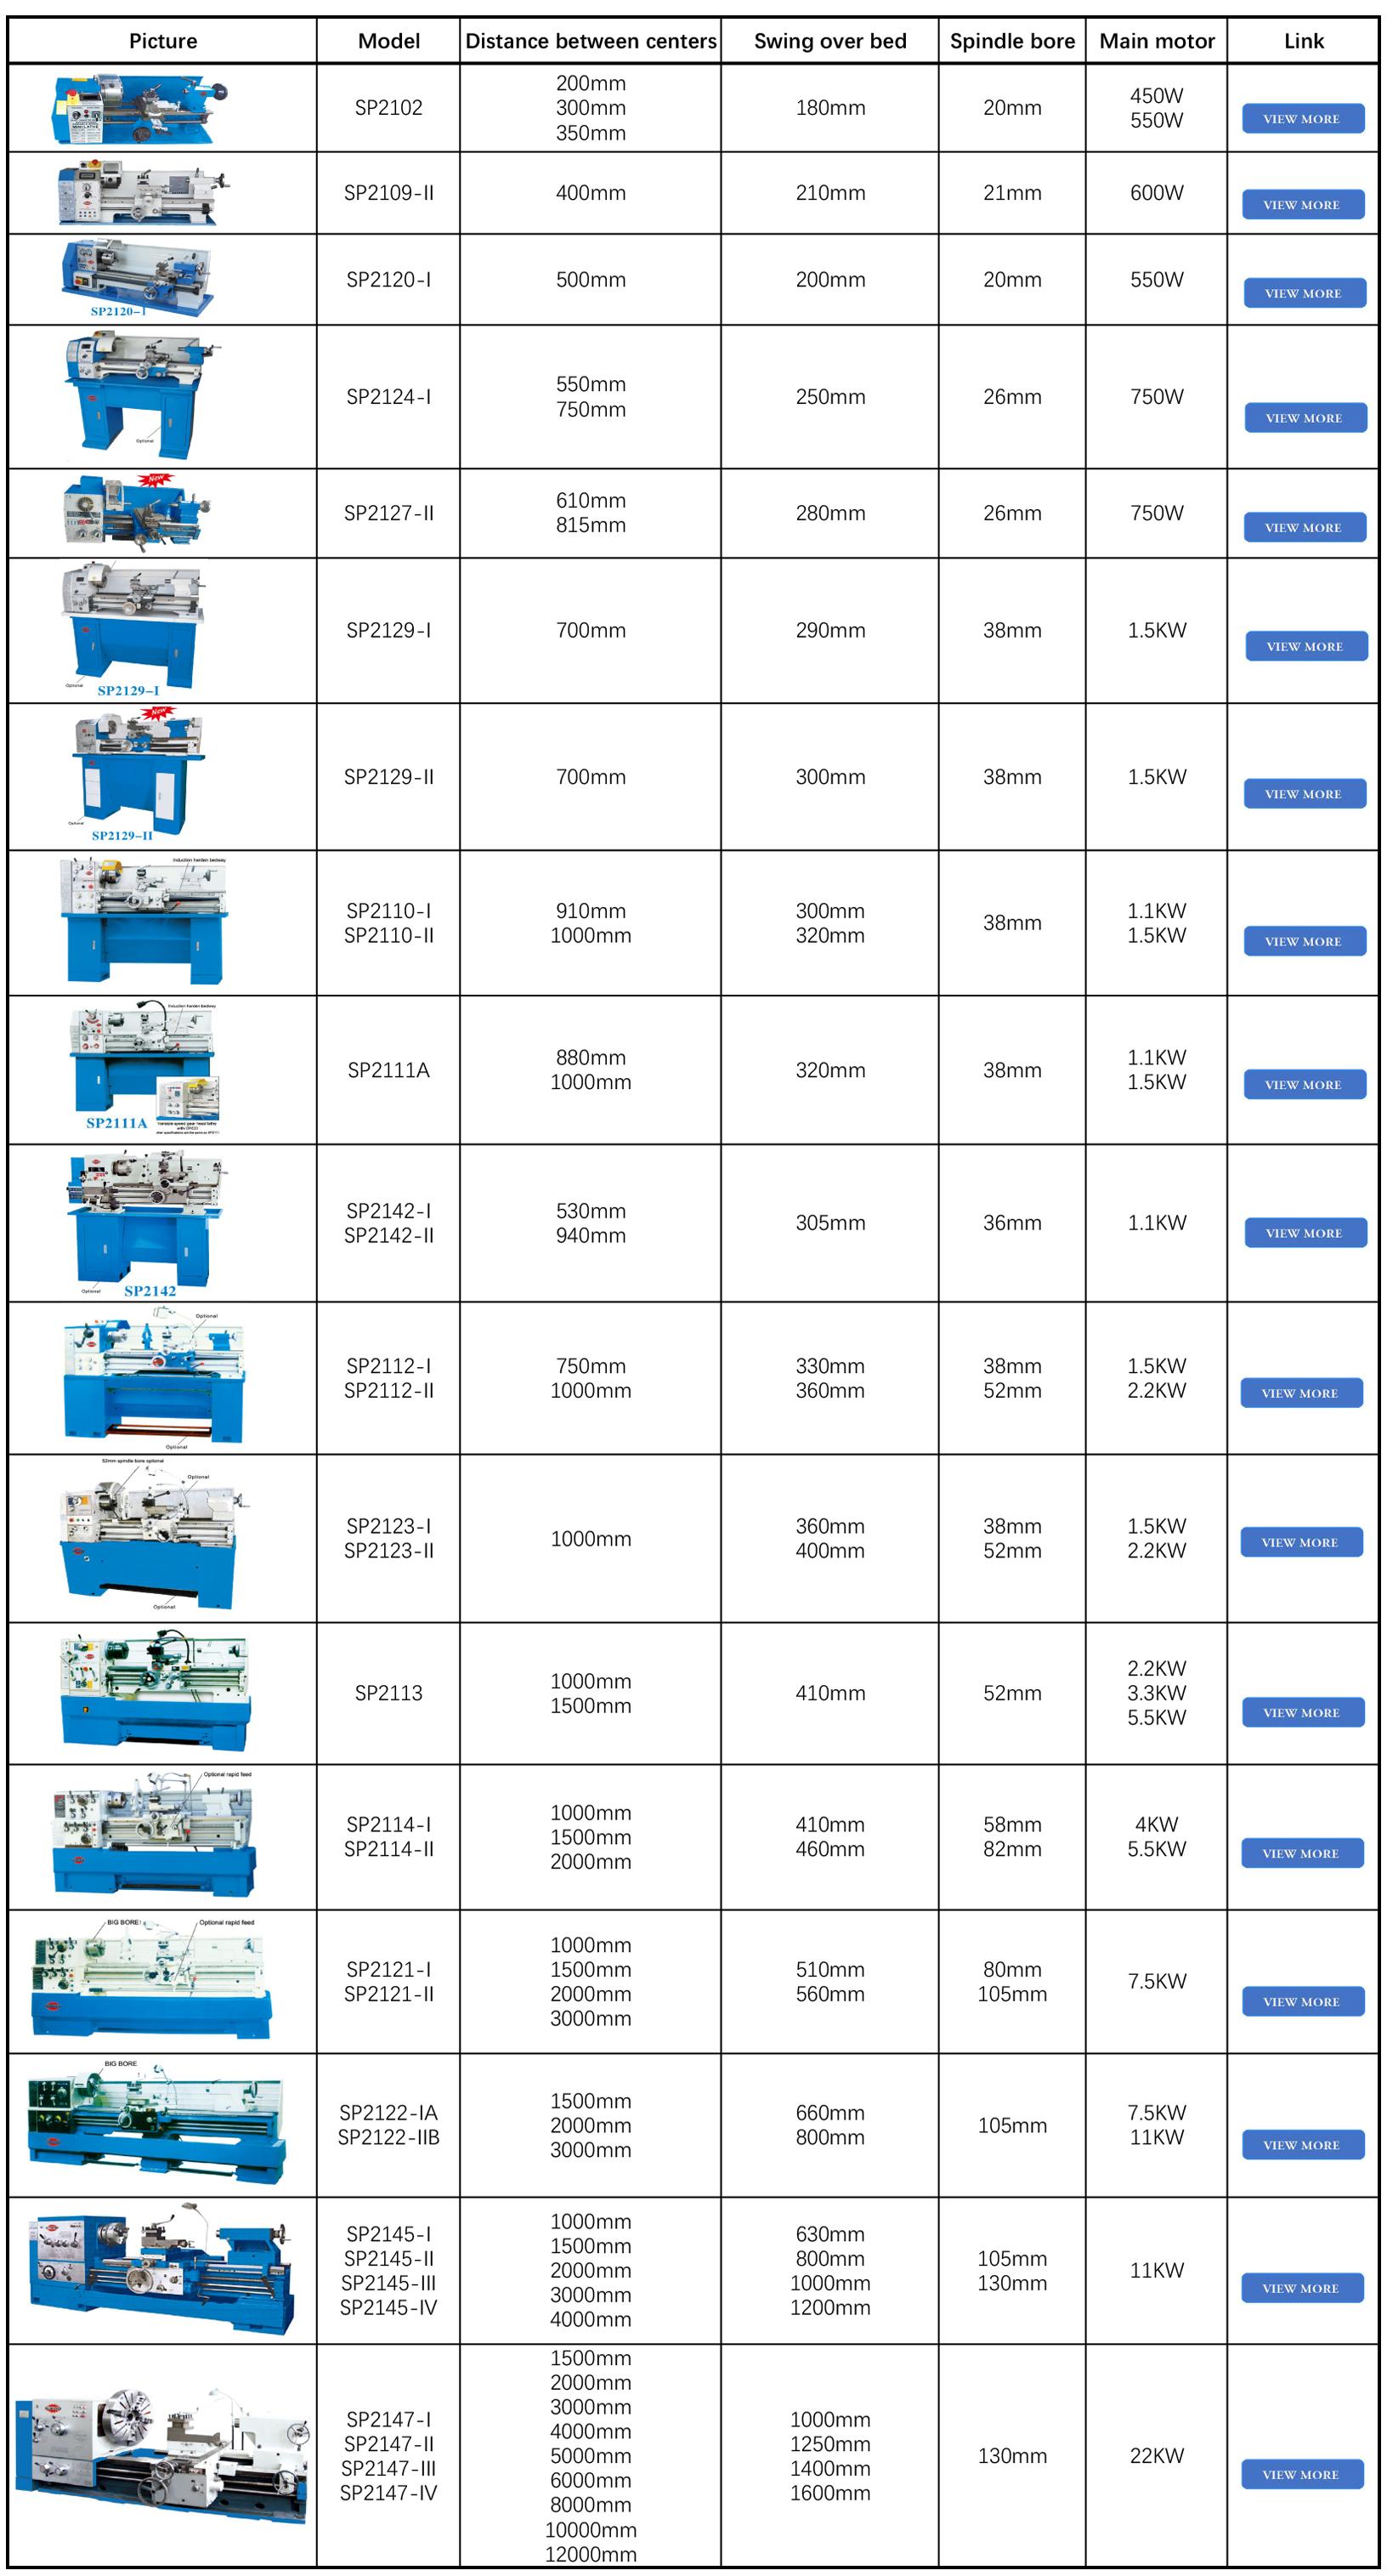 Venda fábrica chinesa diretamente paralela horizontal industrial máquina torno SP2121 (I/II)